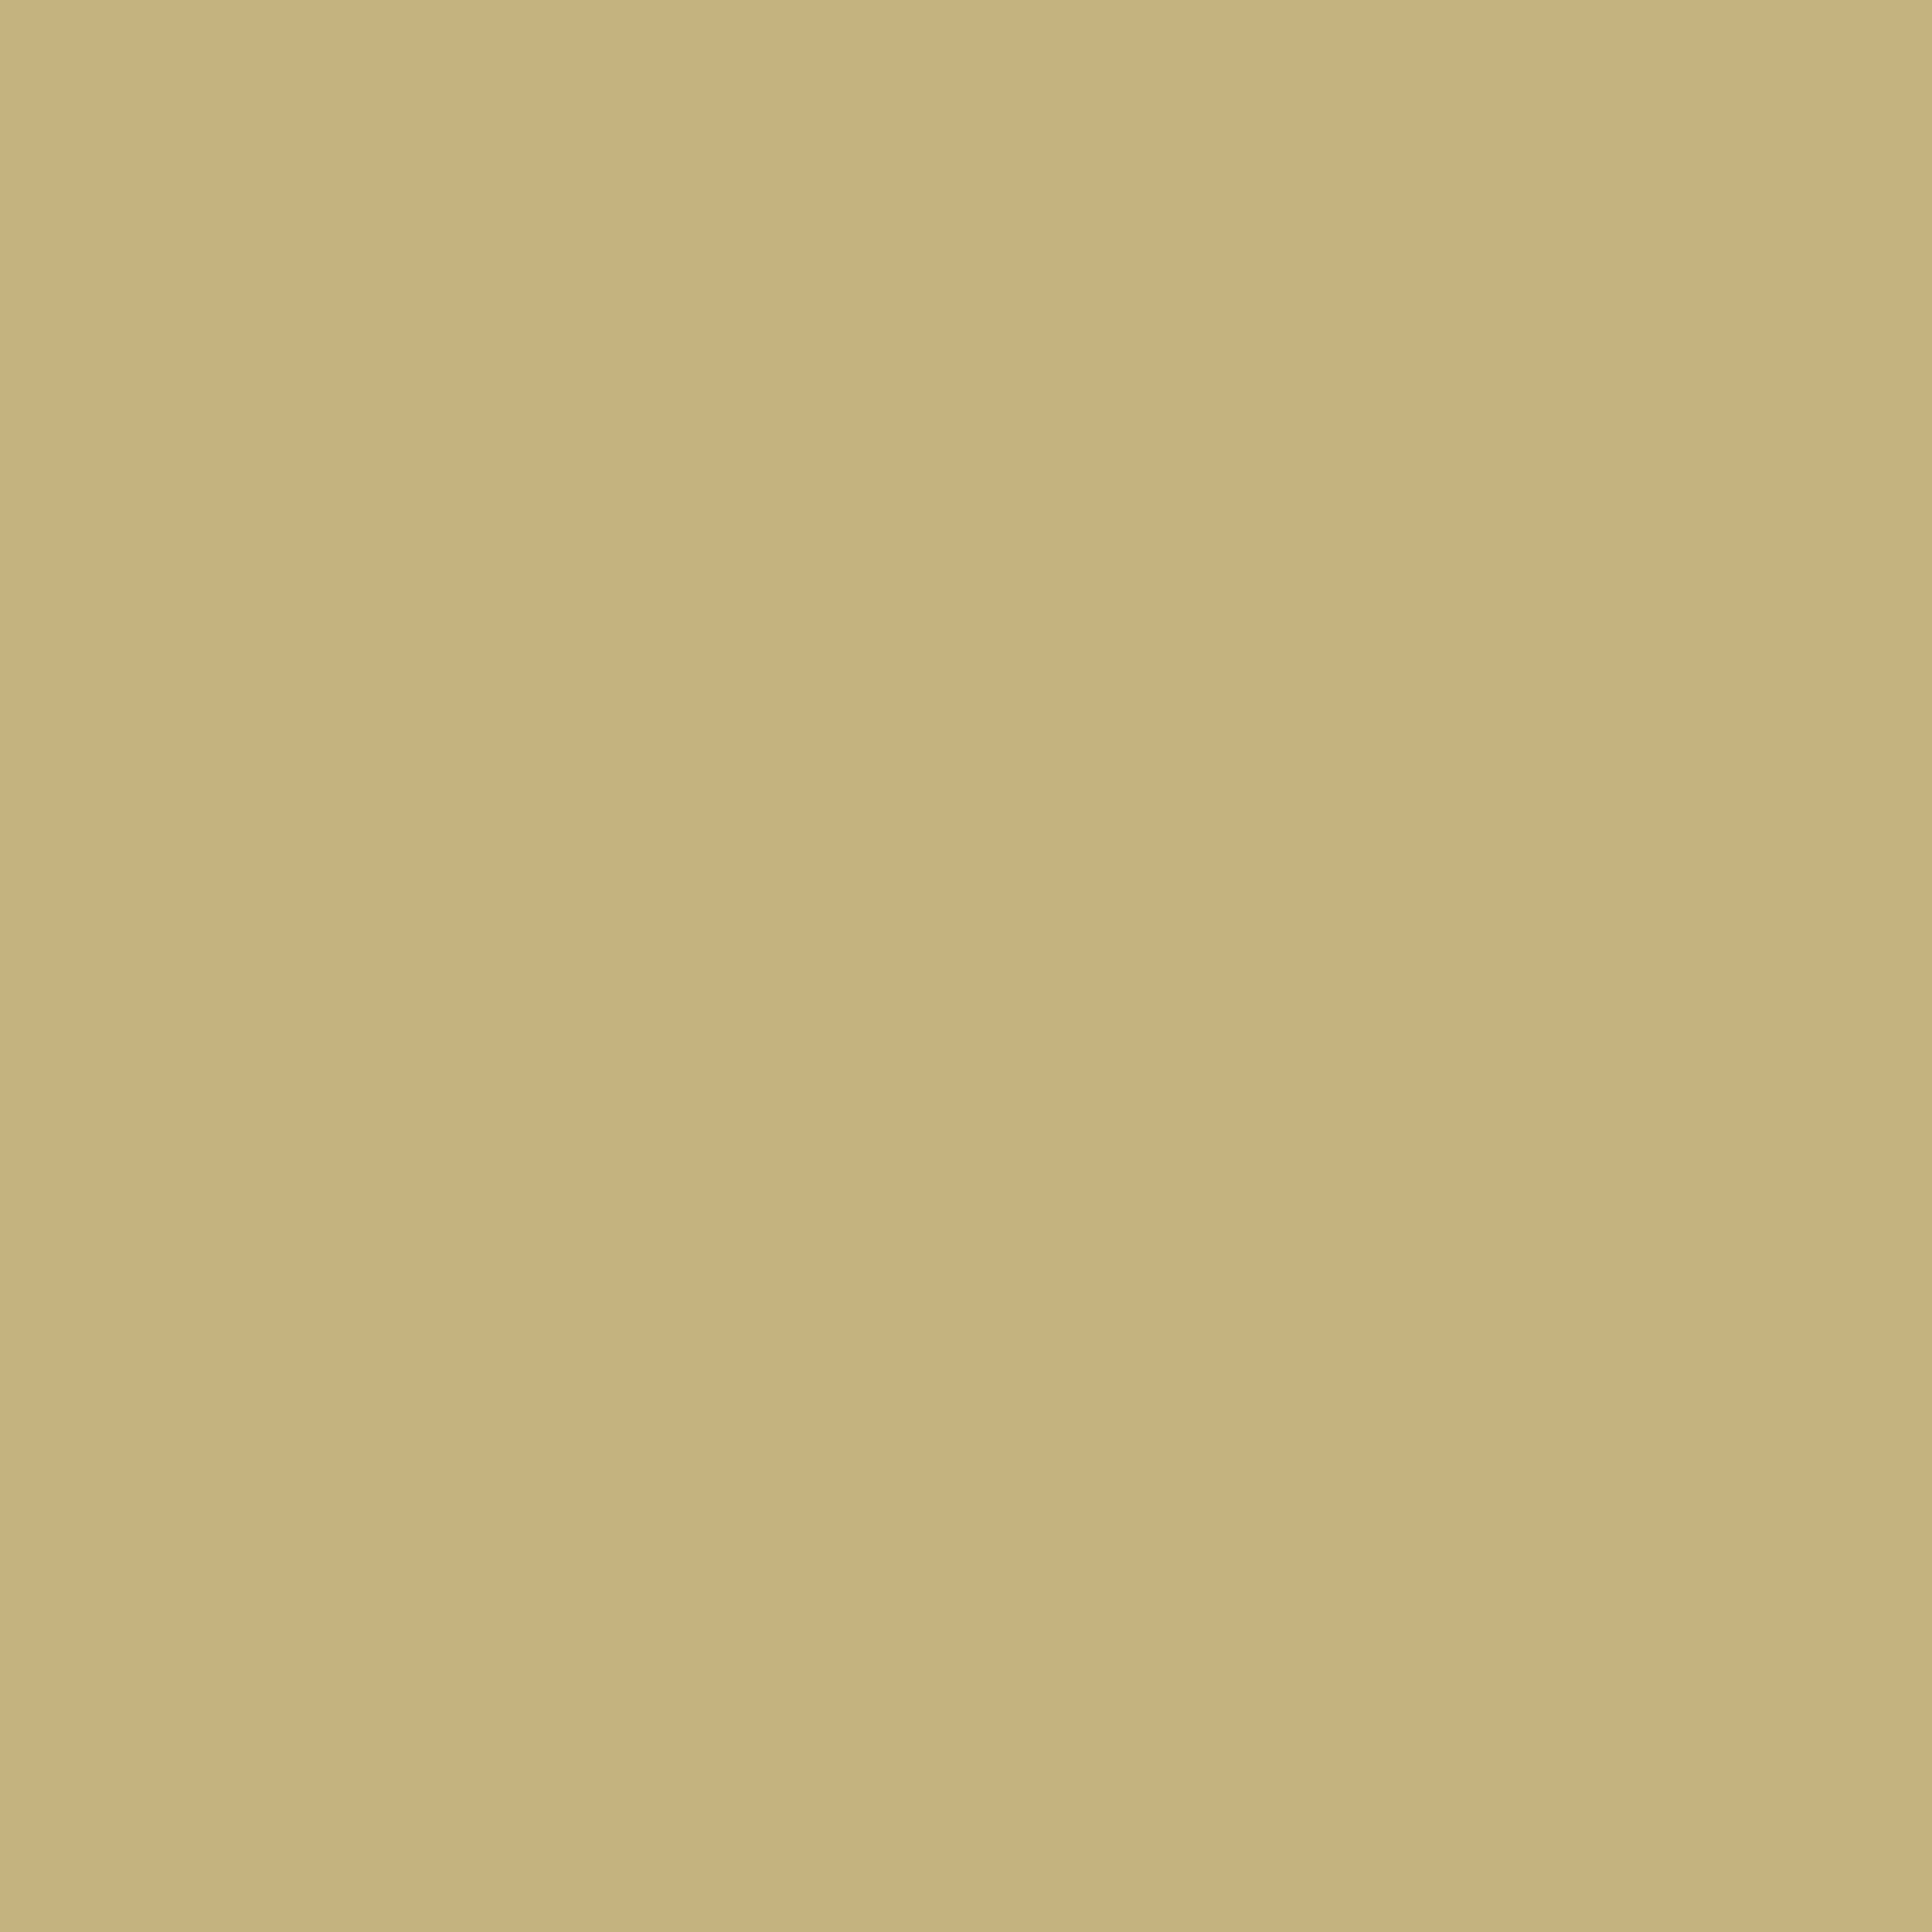 3600x3600 Ecru Solid Color Background